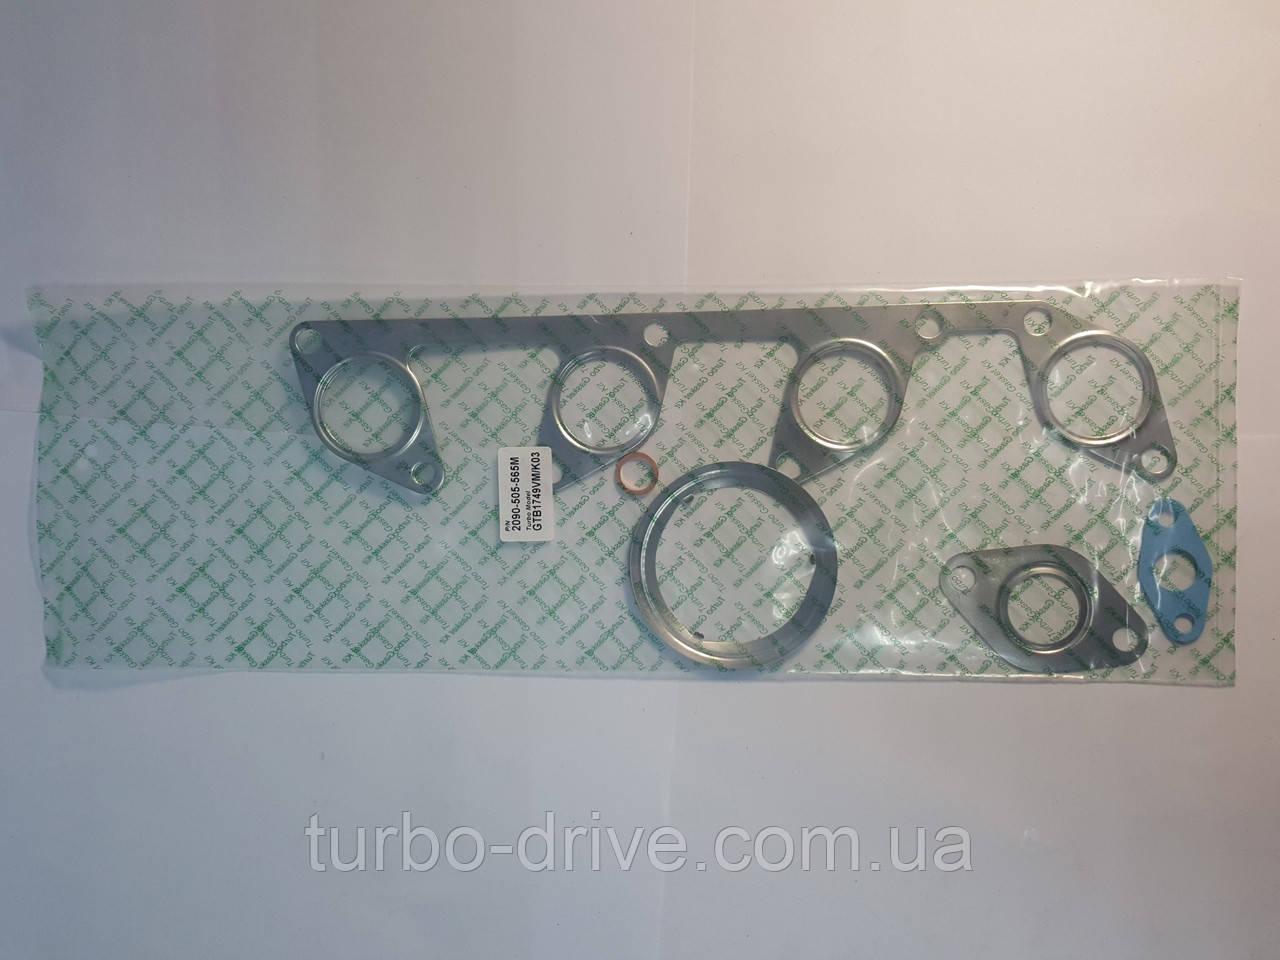 Комплект прокладок турбіни Volkswagen Passat 2.0 TDi